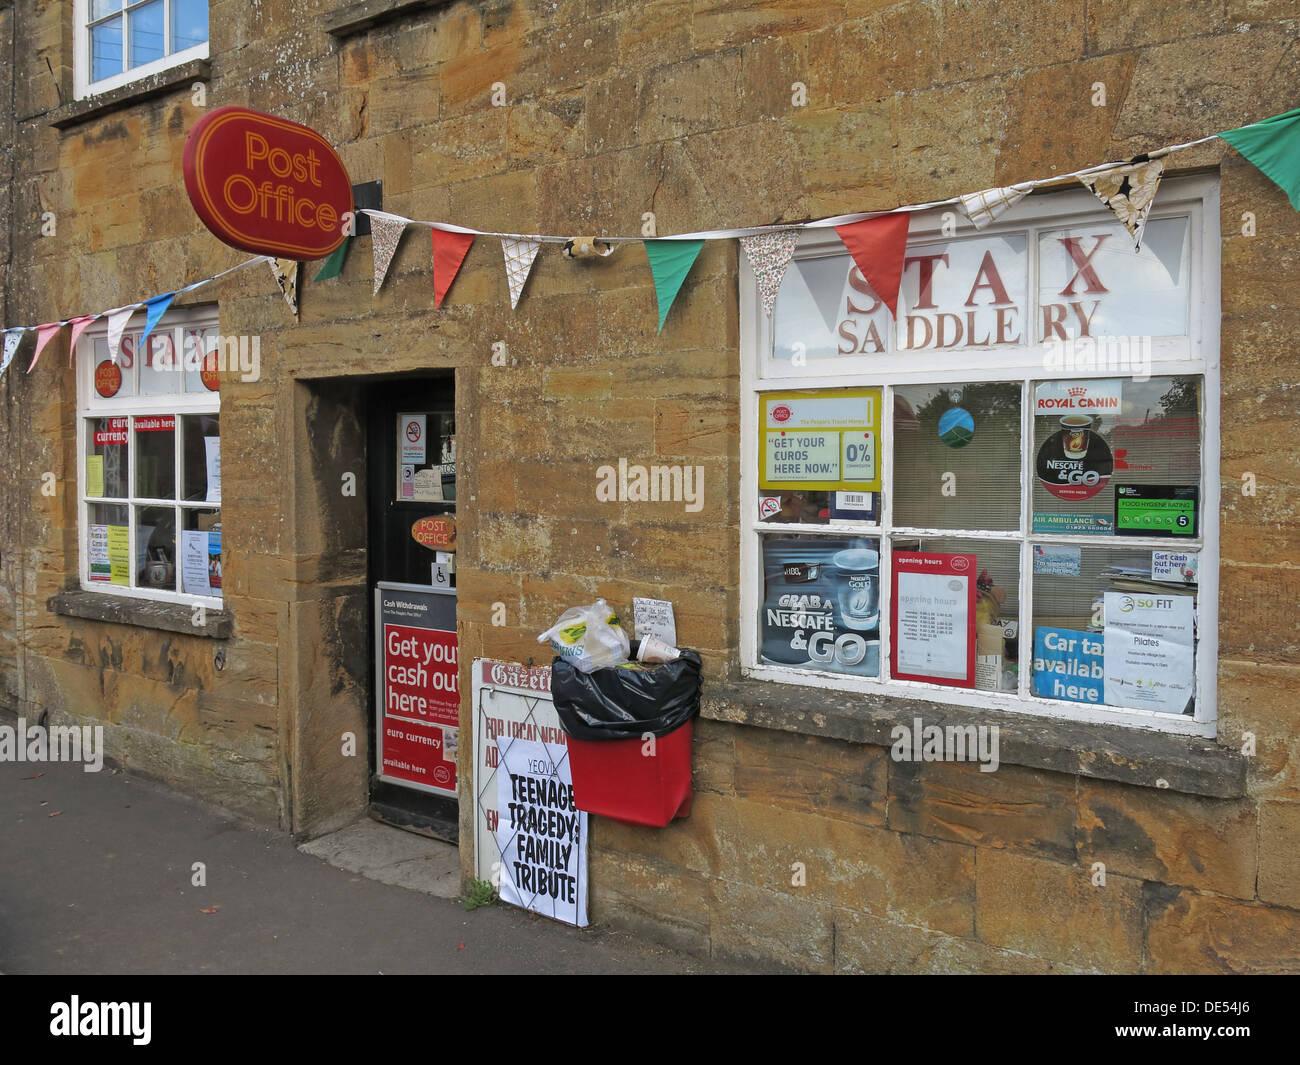 Laden Sie dieses Alamy Stockfoto Montecute Postamt & Stax Saddery, Dorf, South Somerset, England, UK TA15 6XD - DE54J6